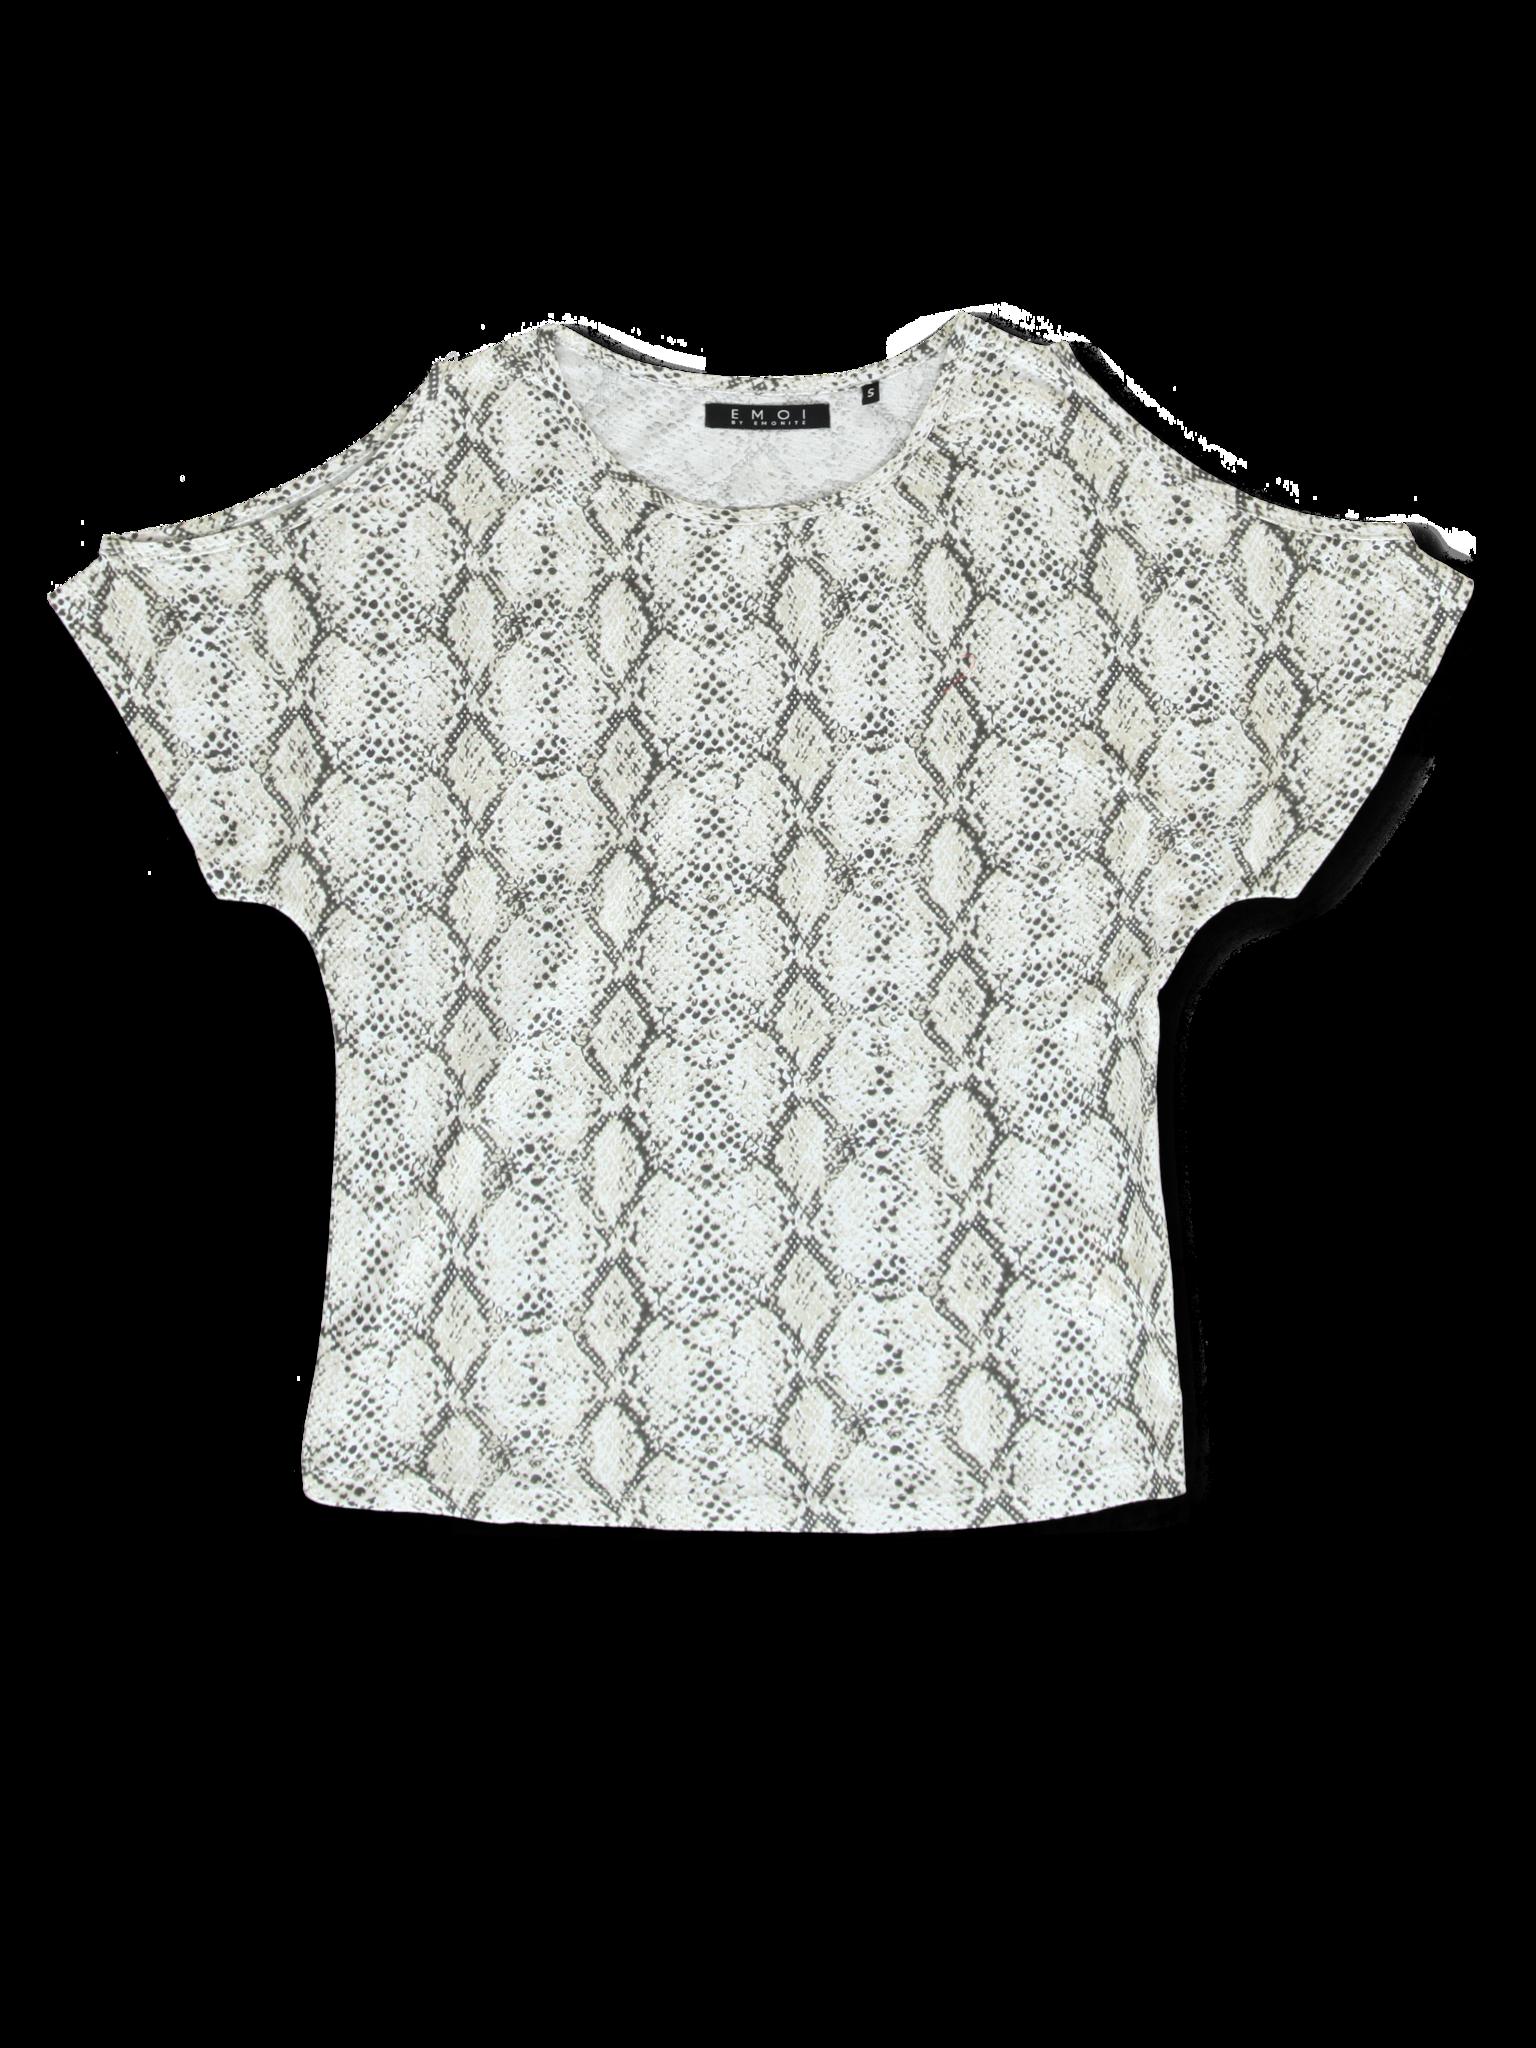 All Brands   Summerproducts Ladies   T-shirt   18 pcs/box